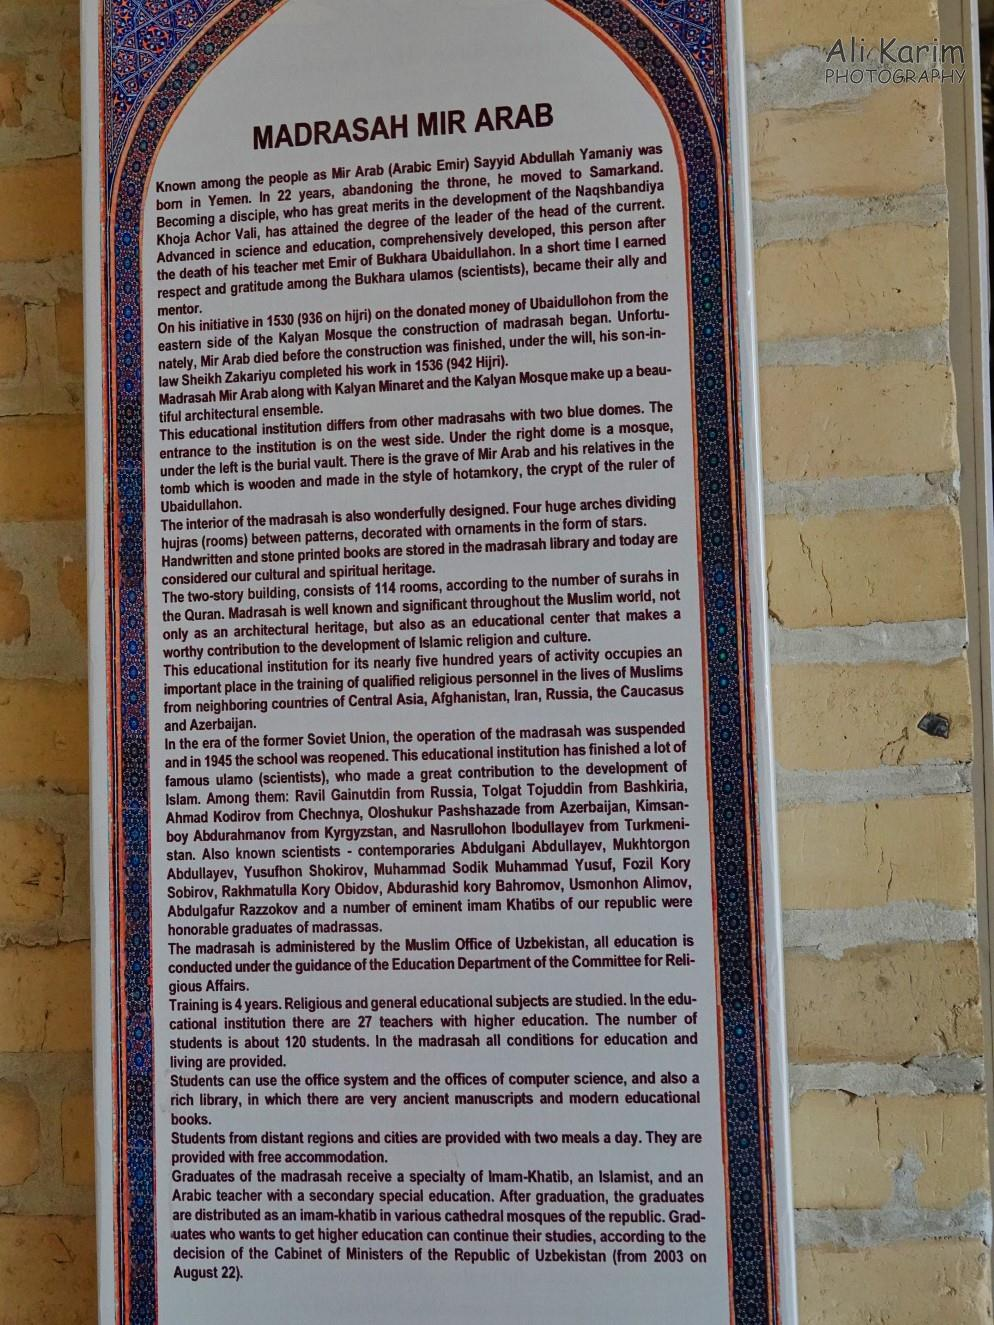 Bukhara, Oct 2019, Very interesting write-up of the Mir Arab Madrassah